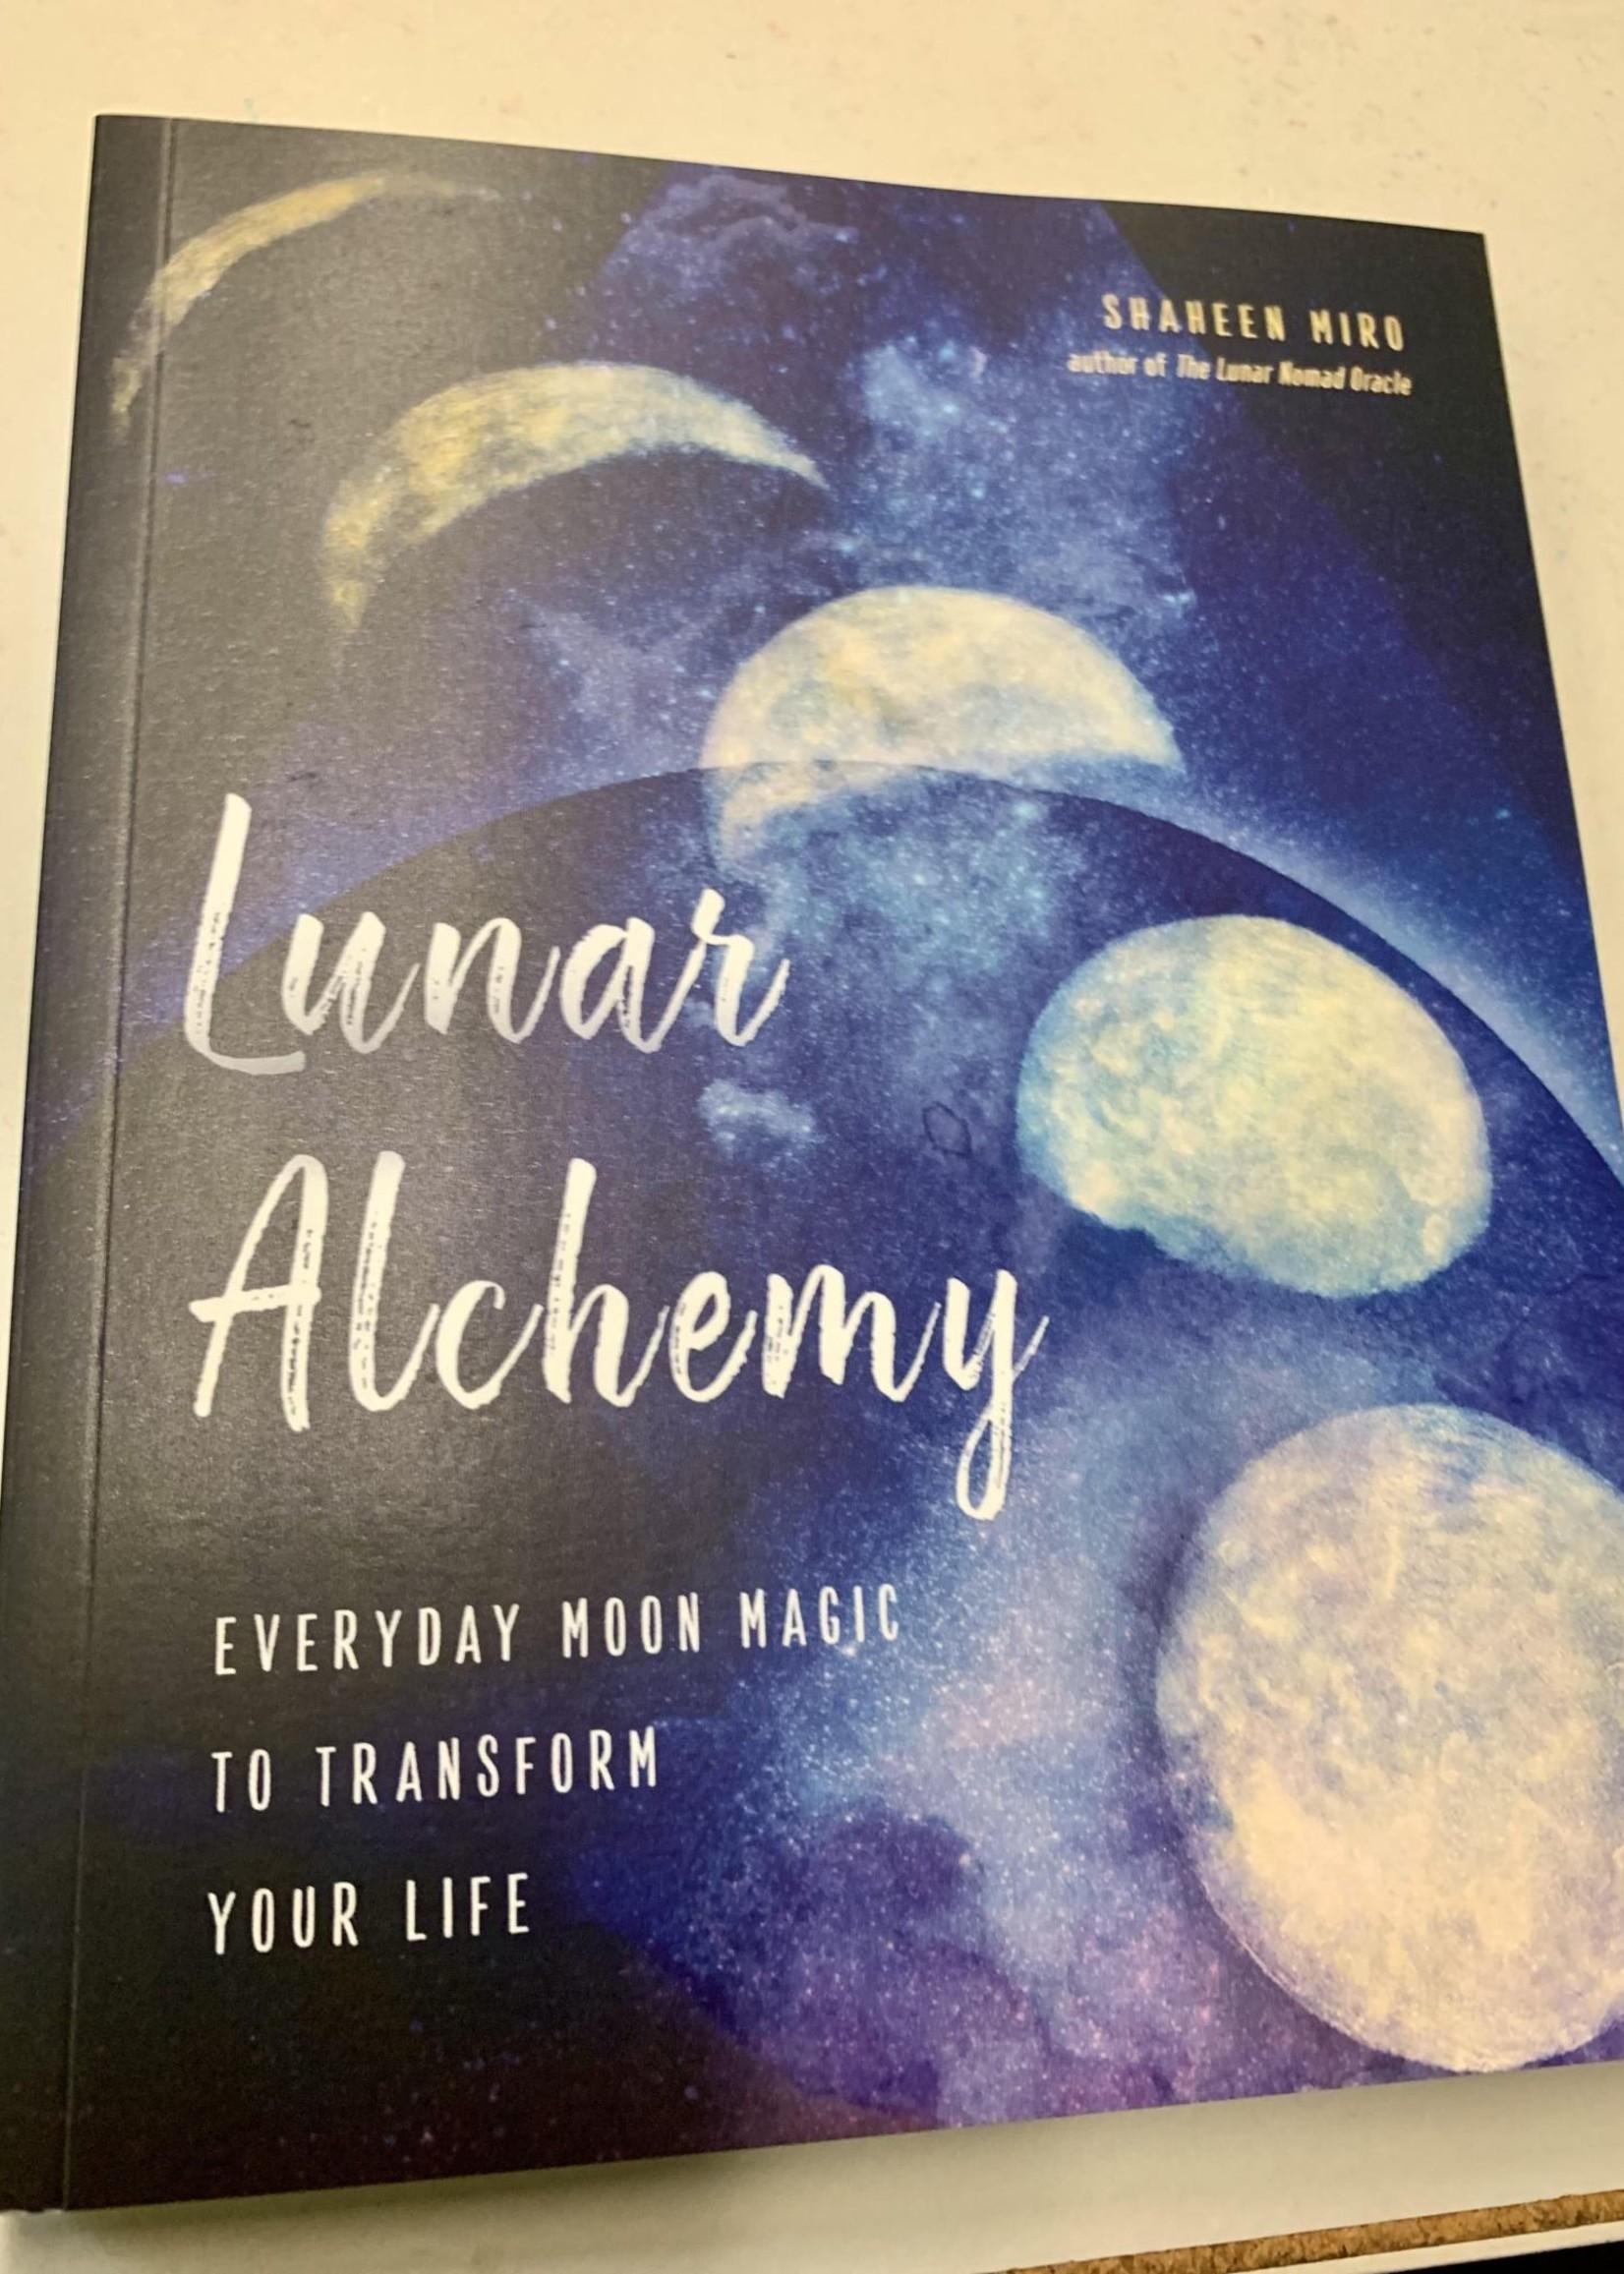 Lunar Alchemy Everyday Moon Magic to Transform Your Life - Shaheen Miro